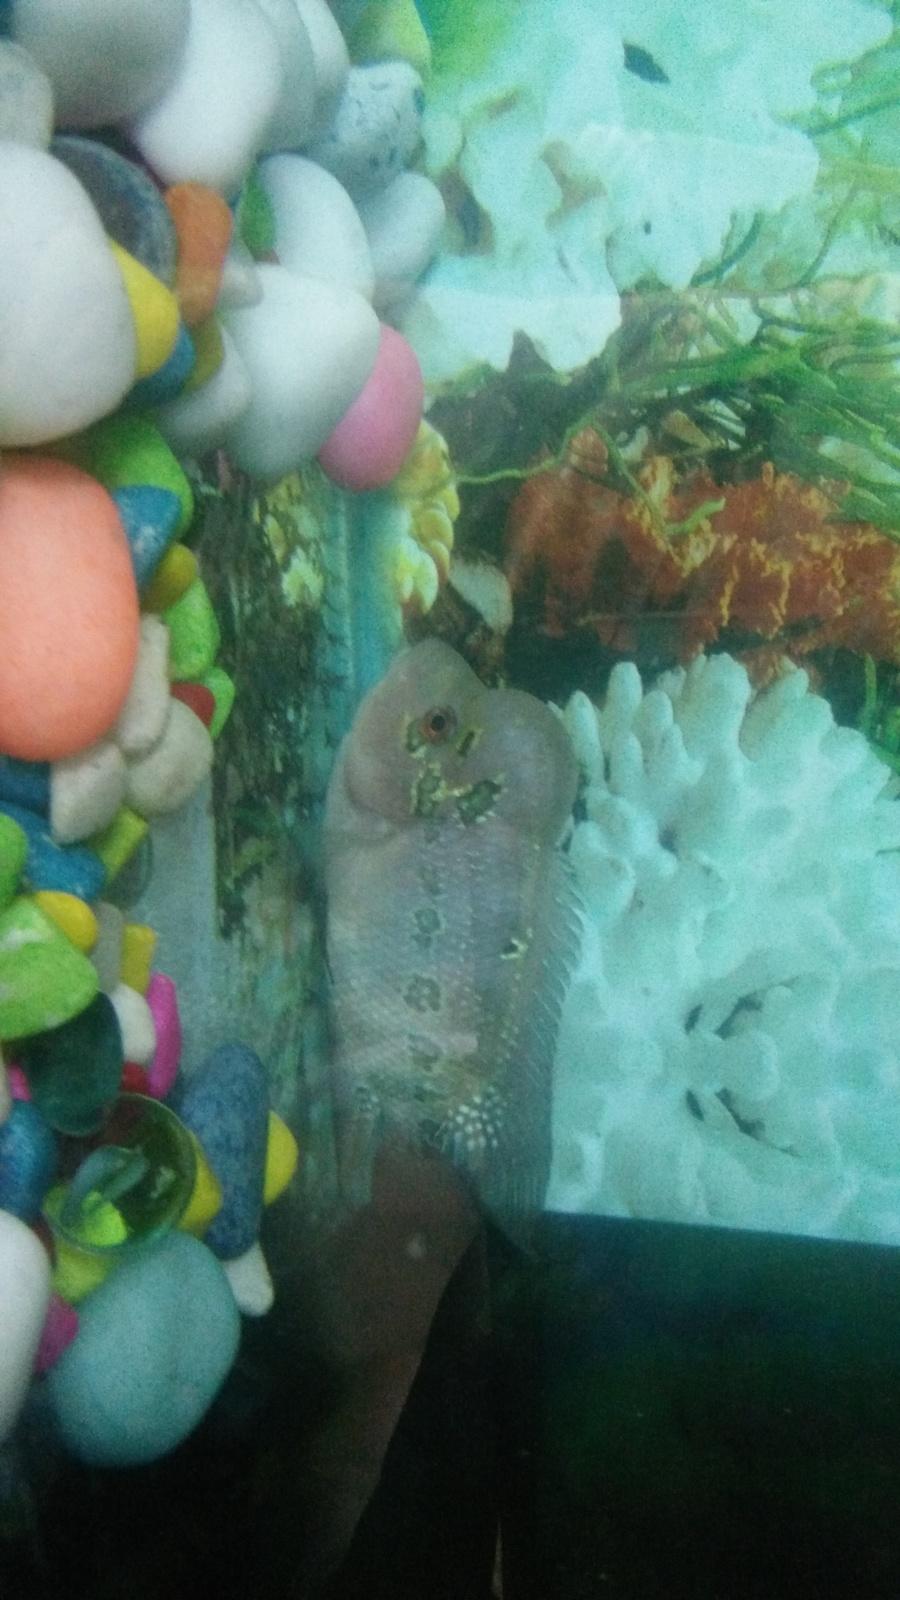 Flowerhorn Changes Color | My Aquarium Club